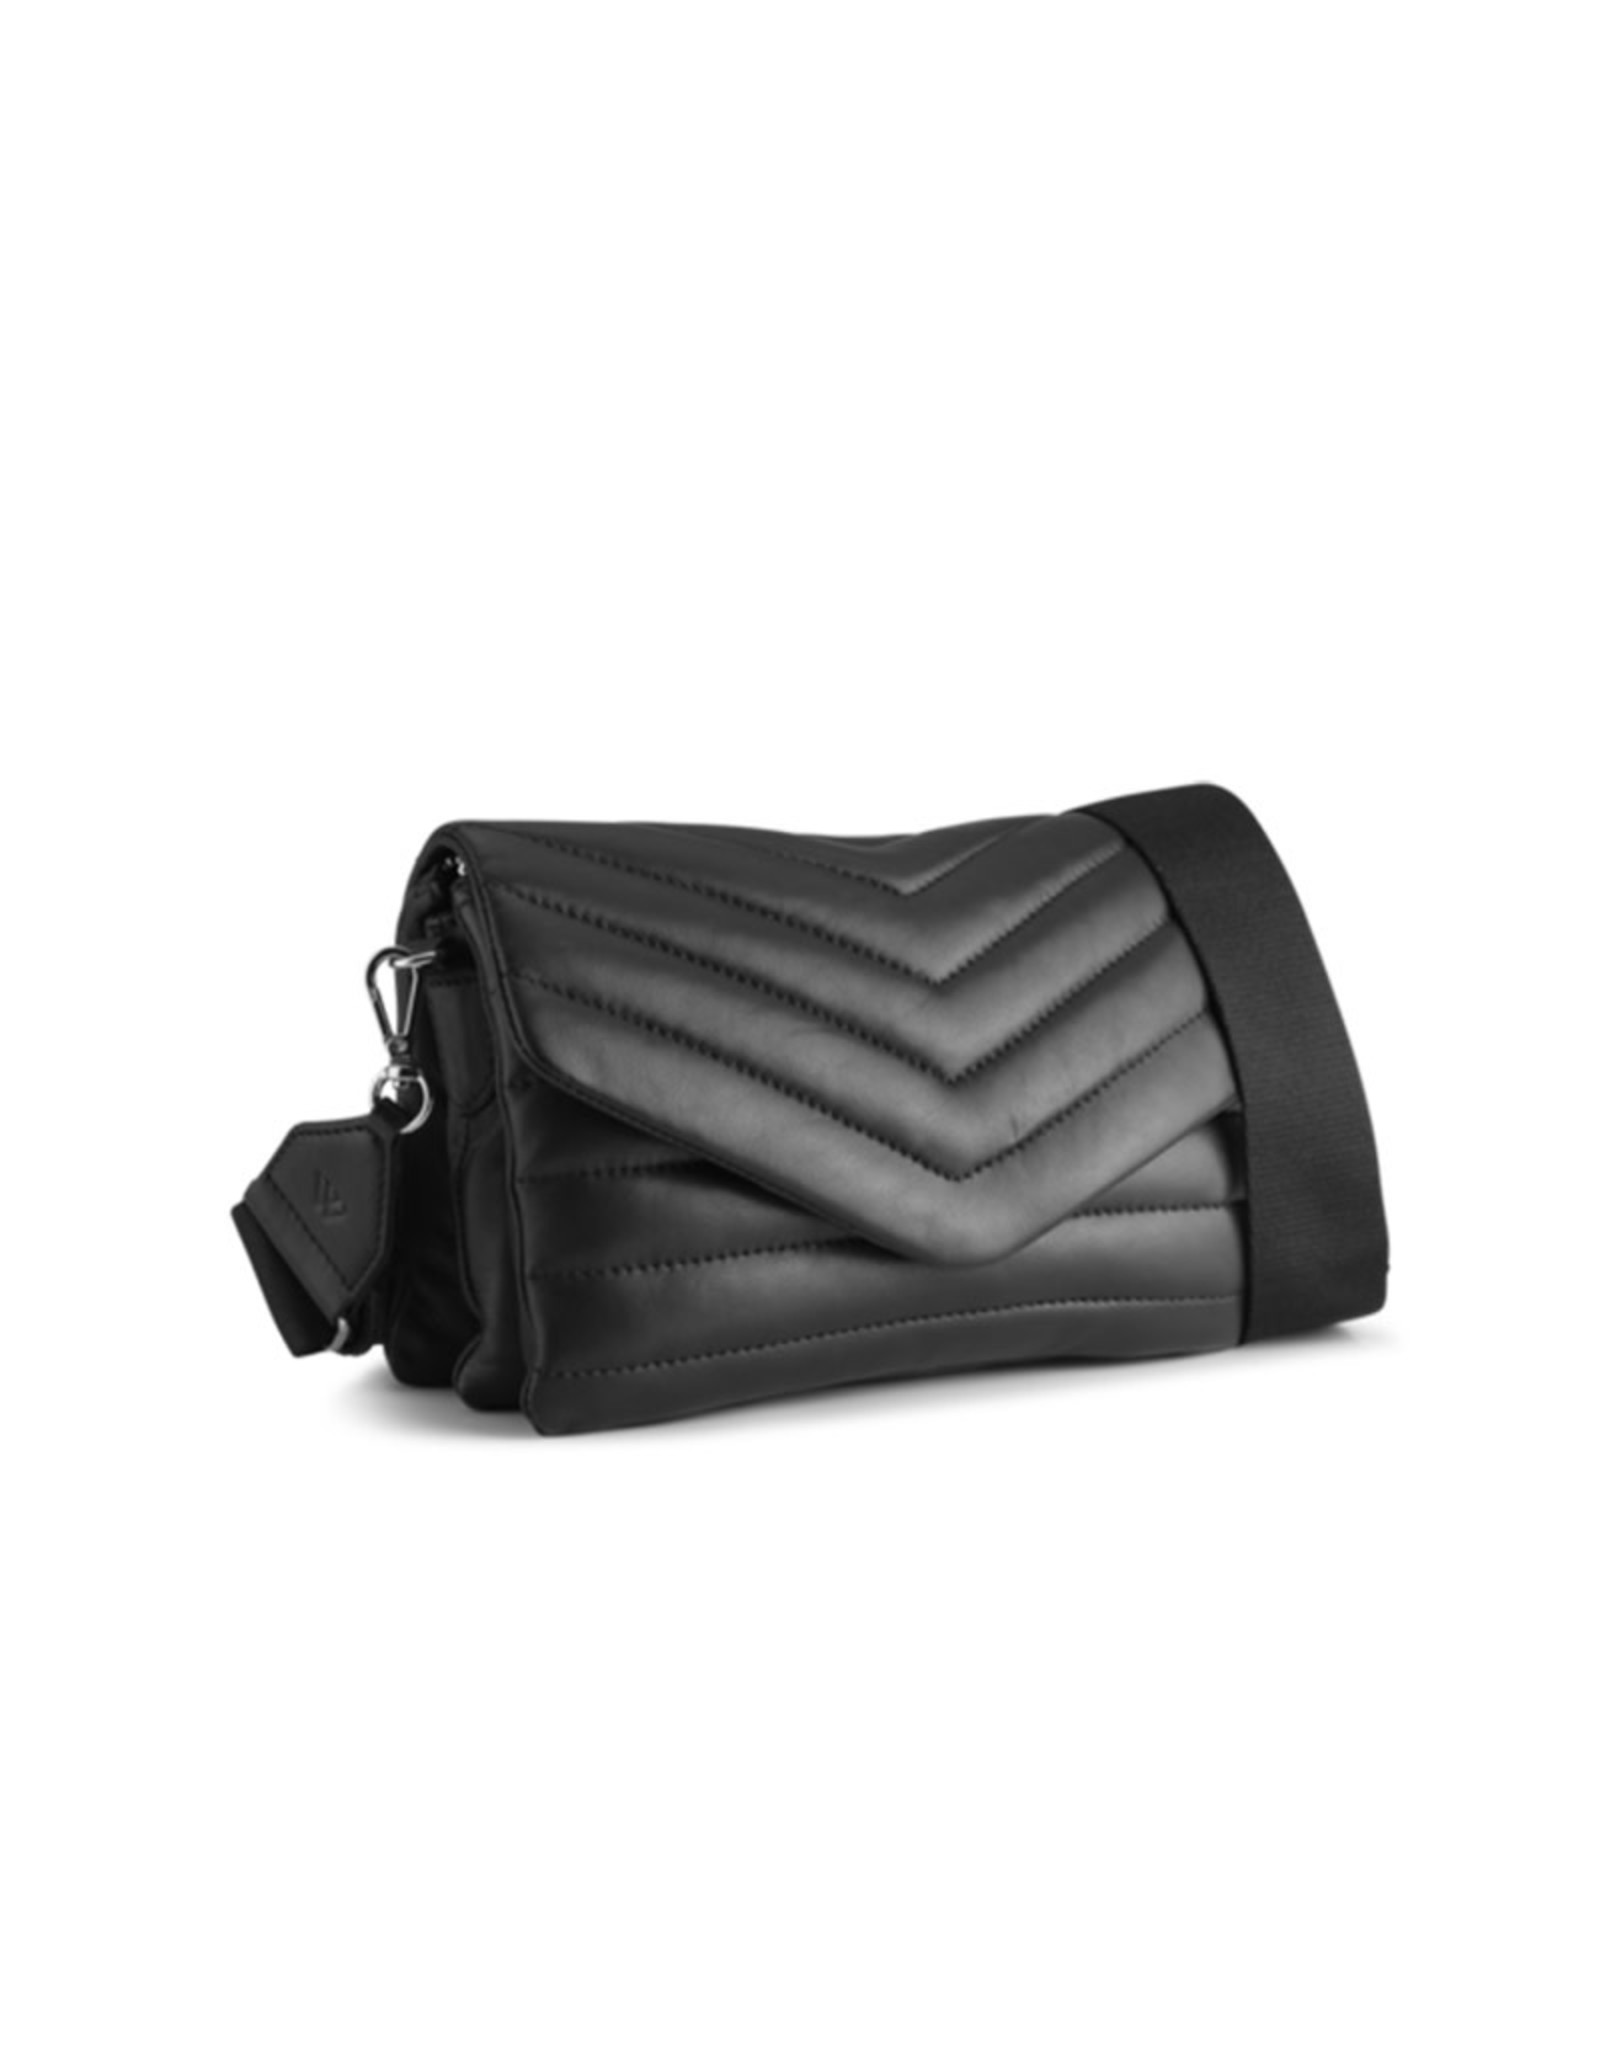 Markberg Susana Puffer Crossbody Bag